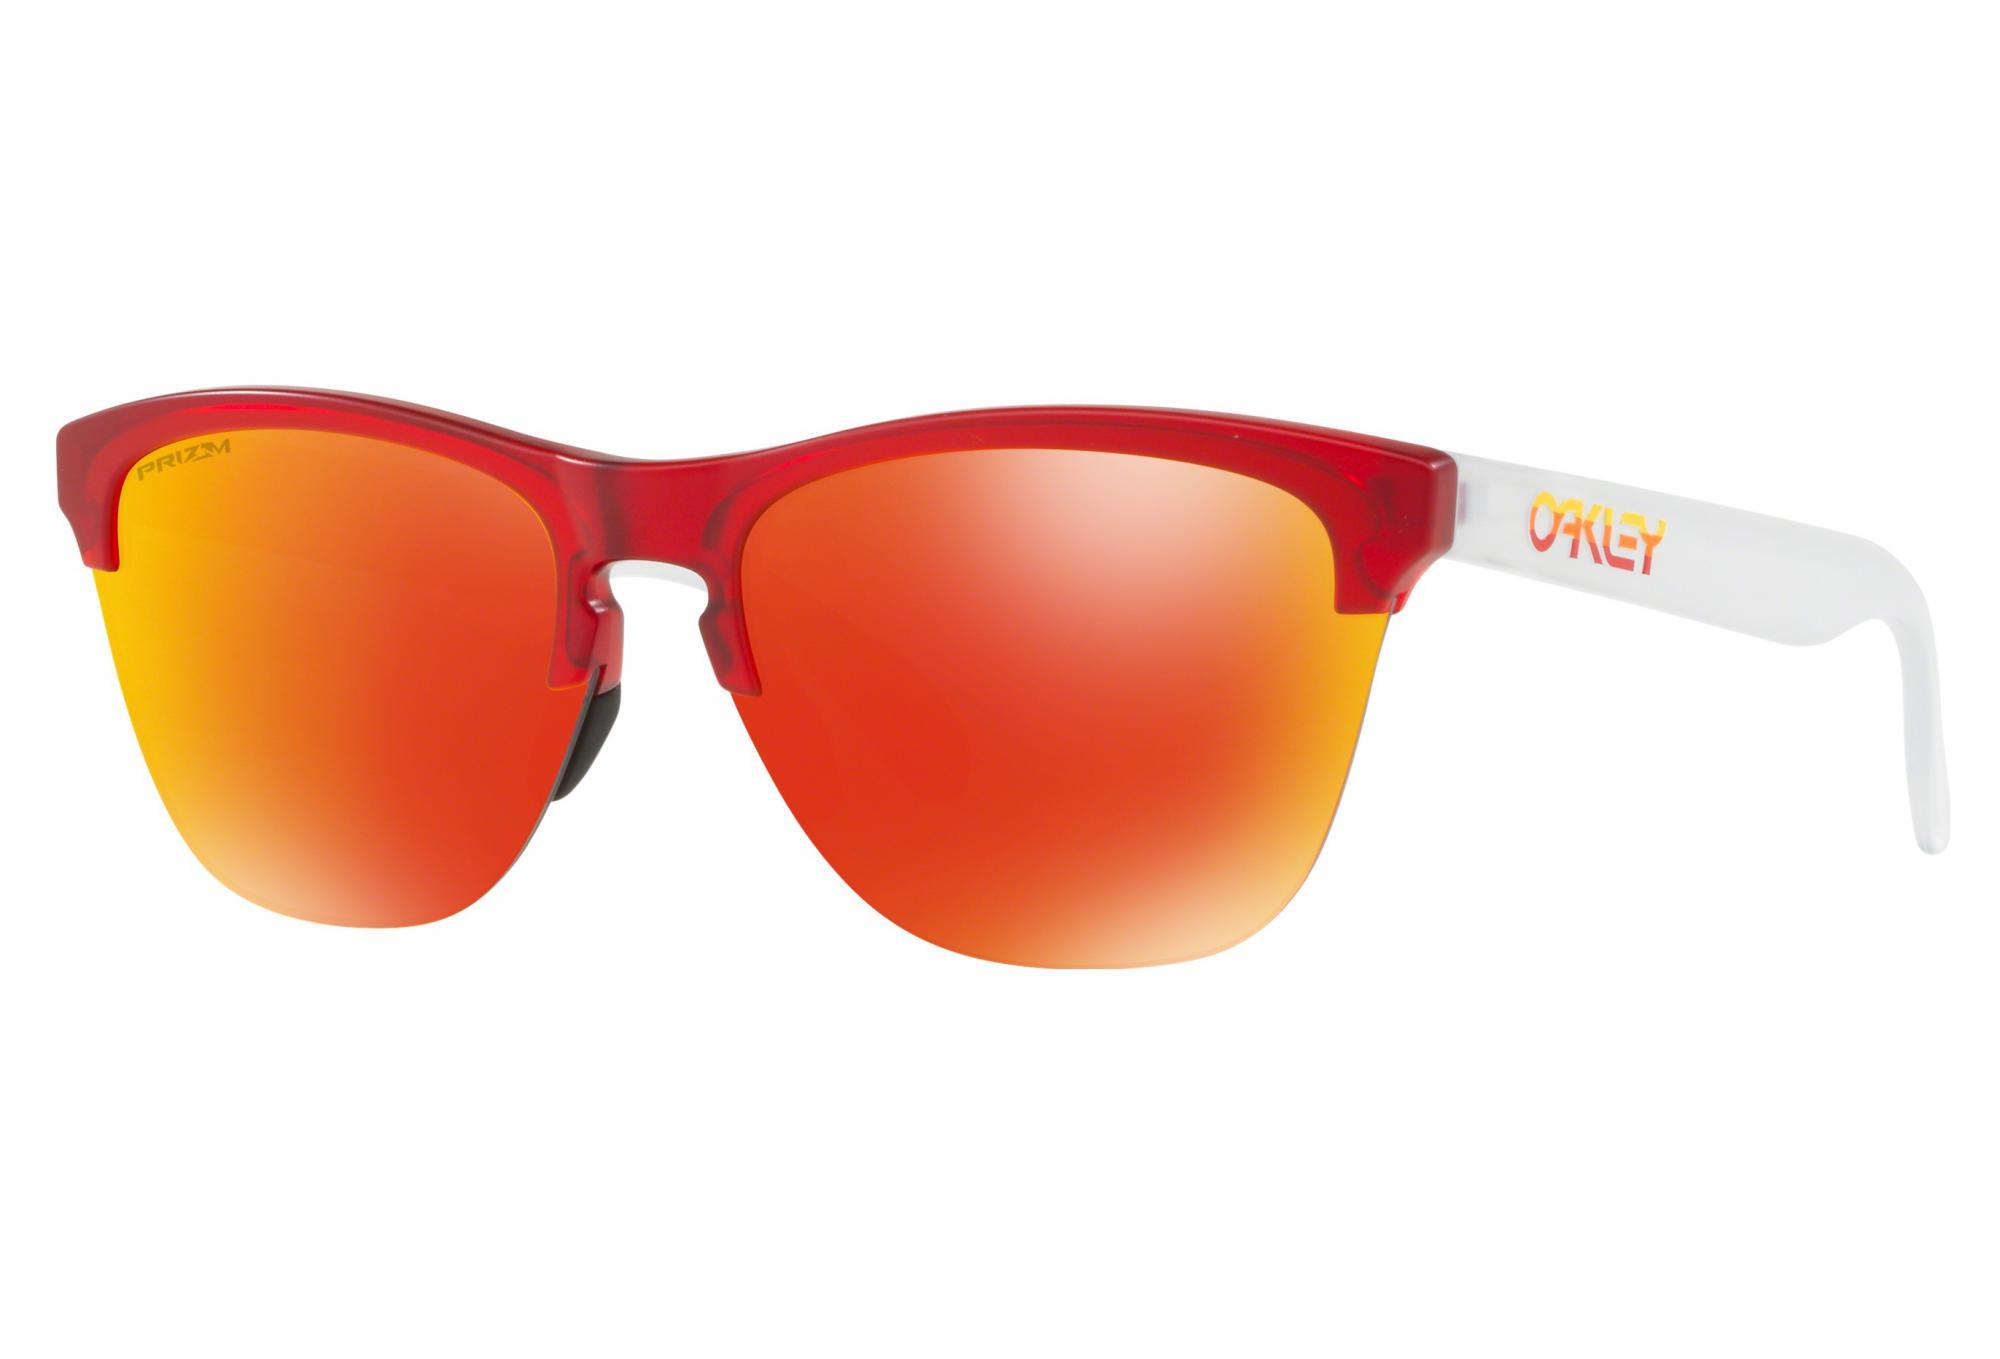 929100953ef OAKLEY Sunglasses Frogskins Lite Black - PRIZM Ruby OO9374-0463 ...